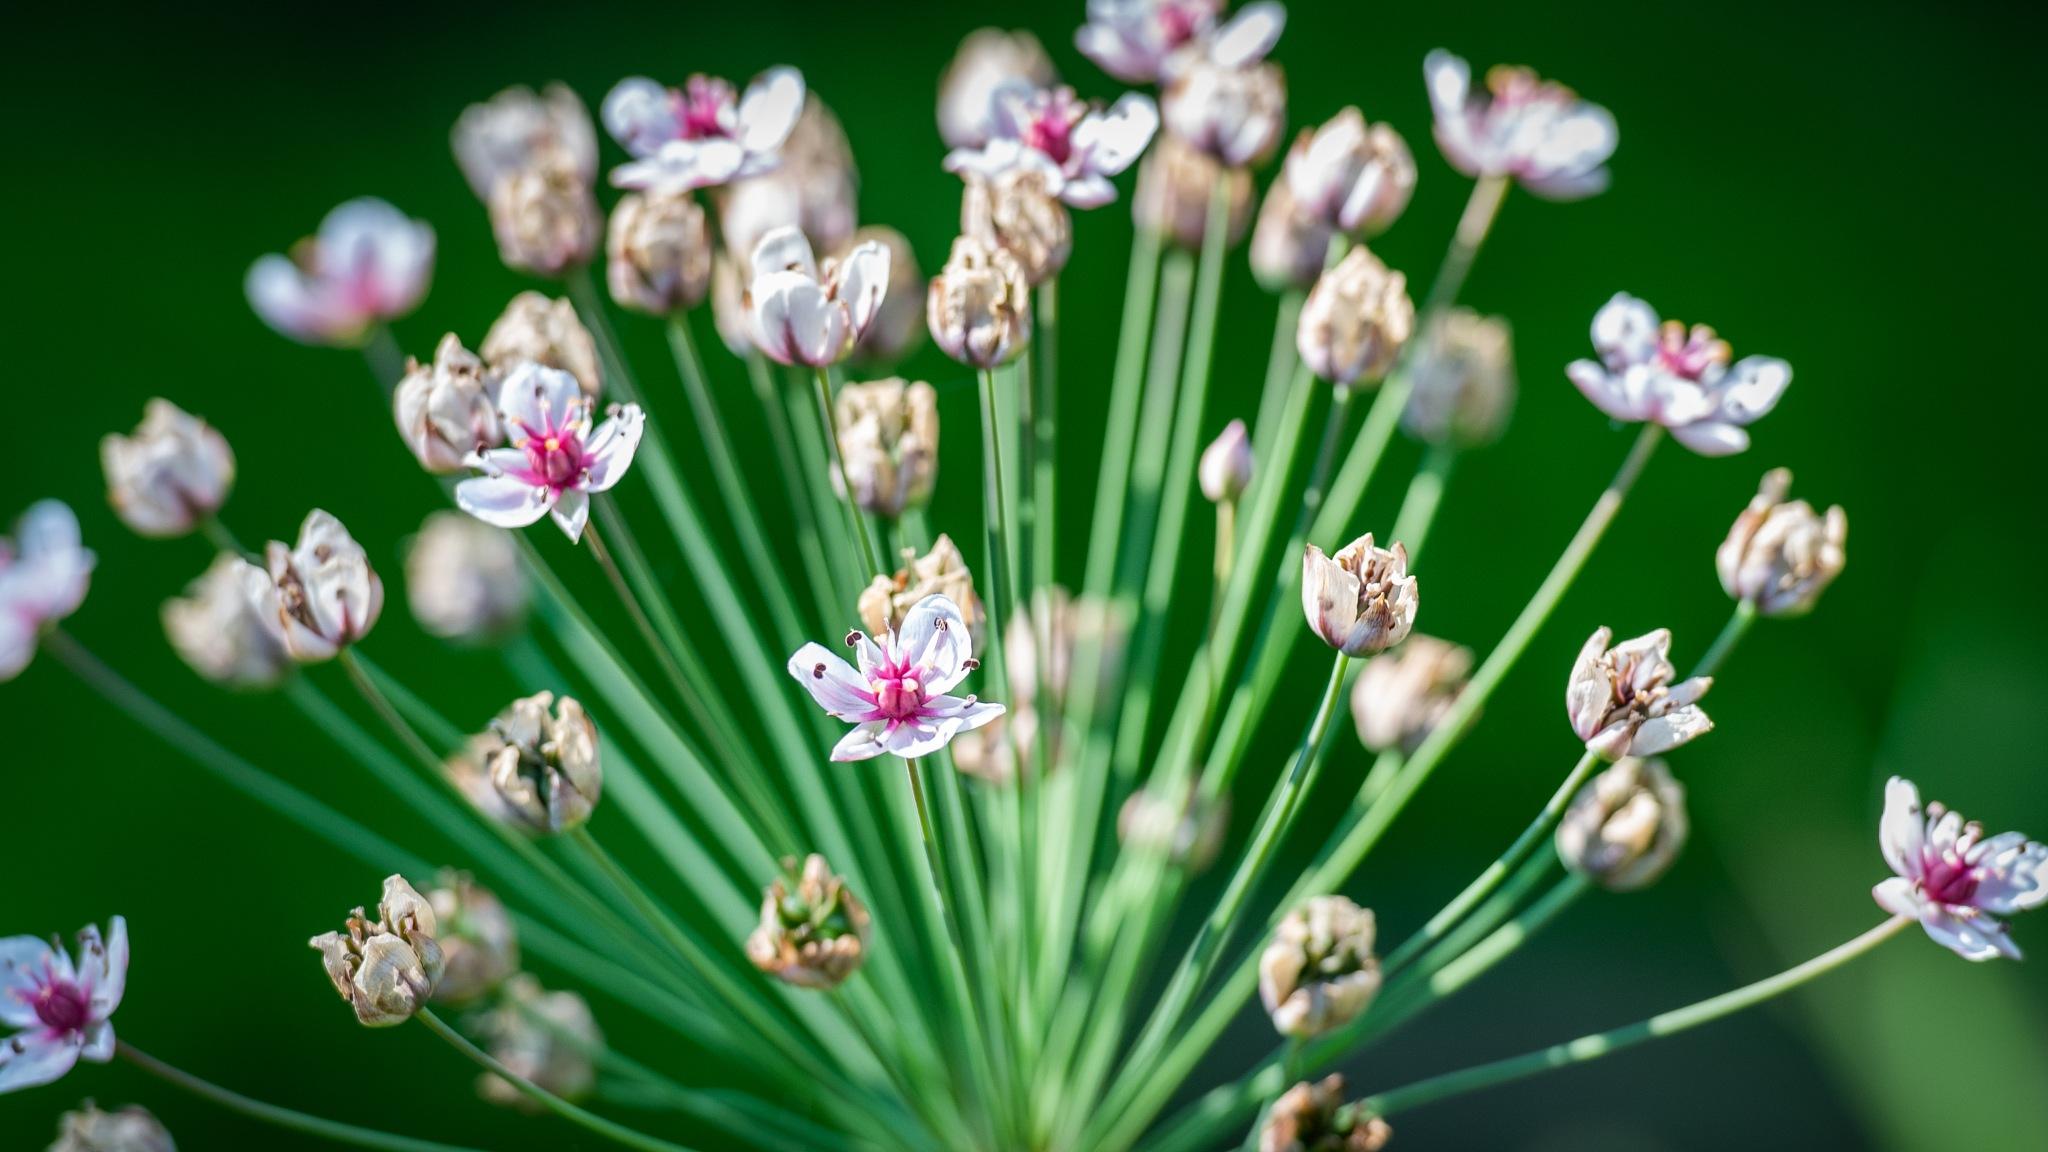 Flower by LancePangborn